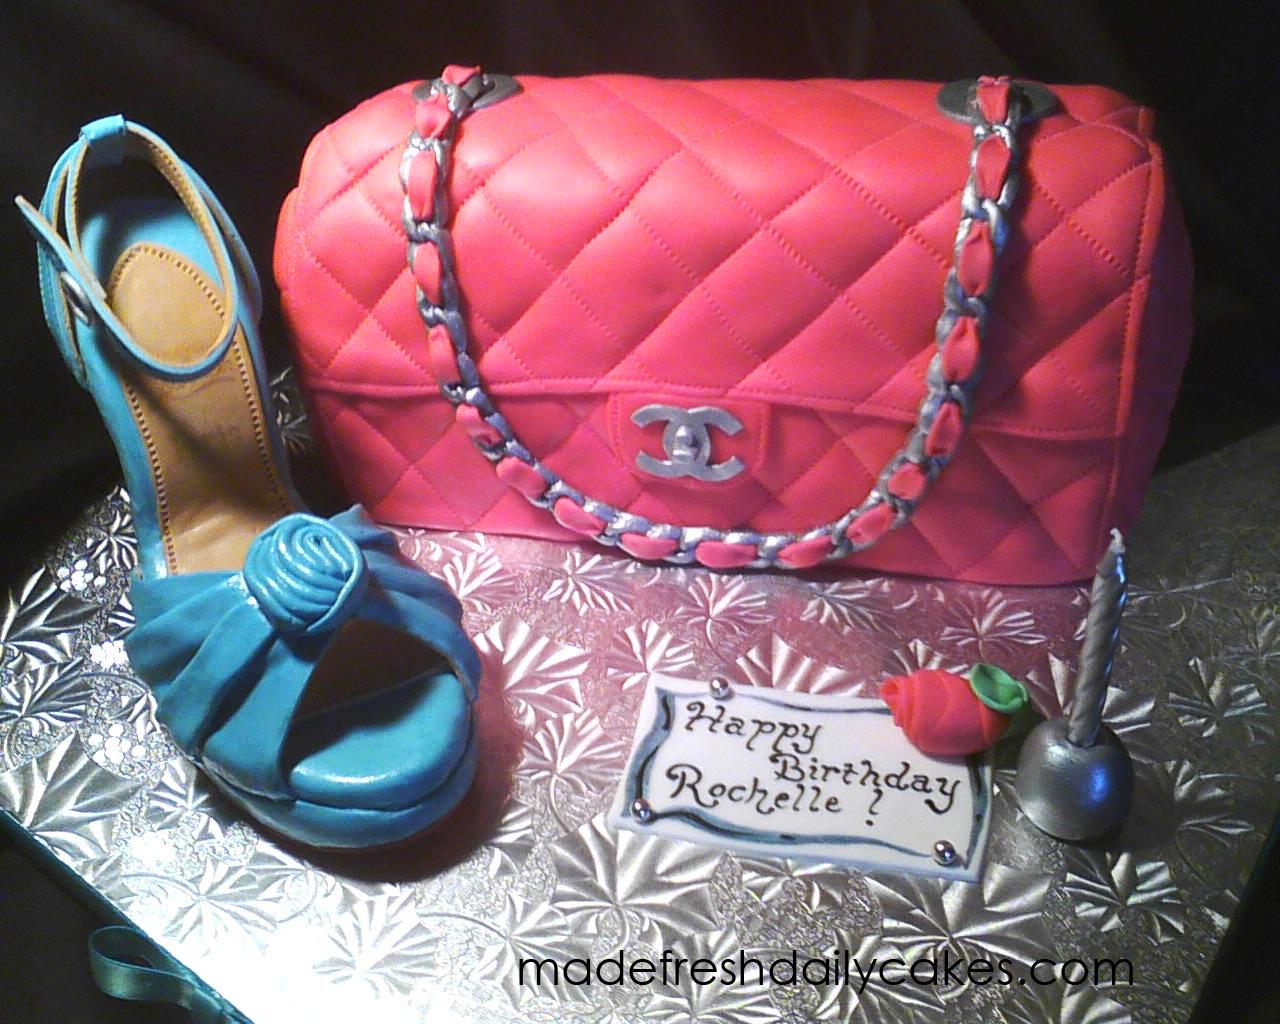 f3cf453735d1 made FRESH daily  Pink Chanel Handbag Cake!